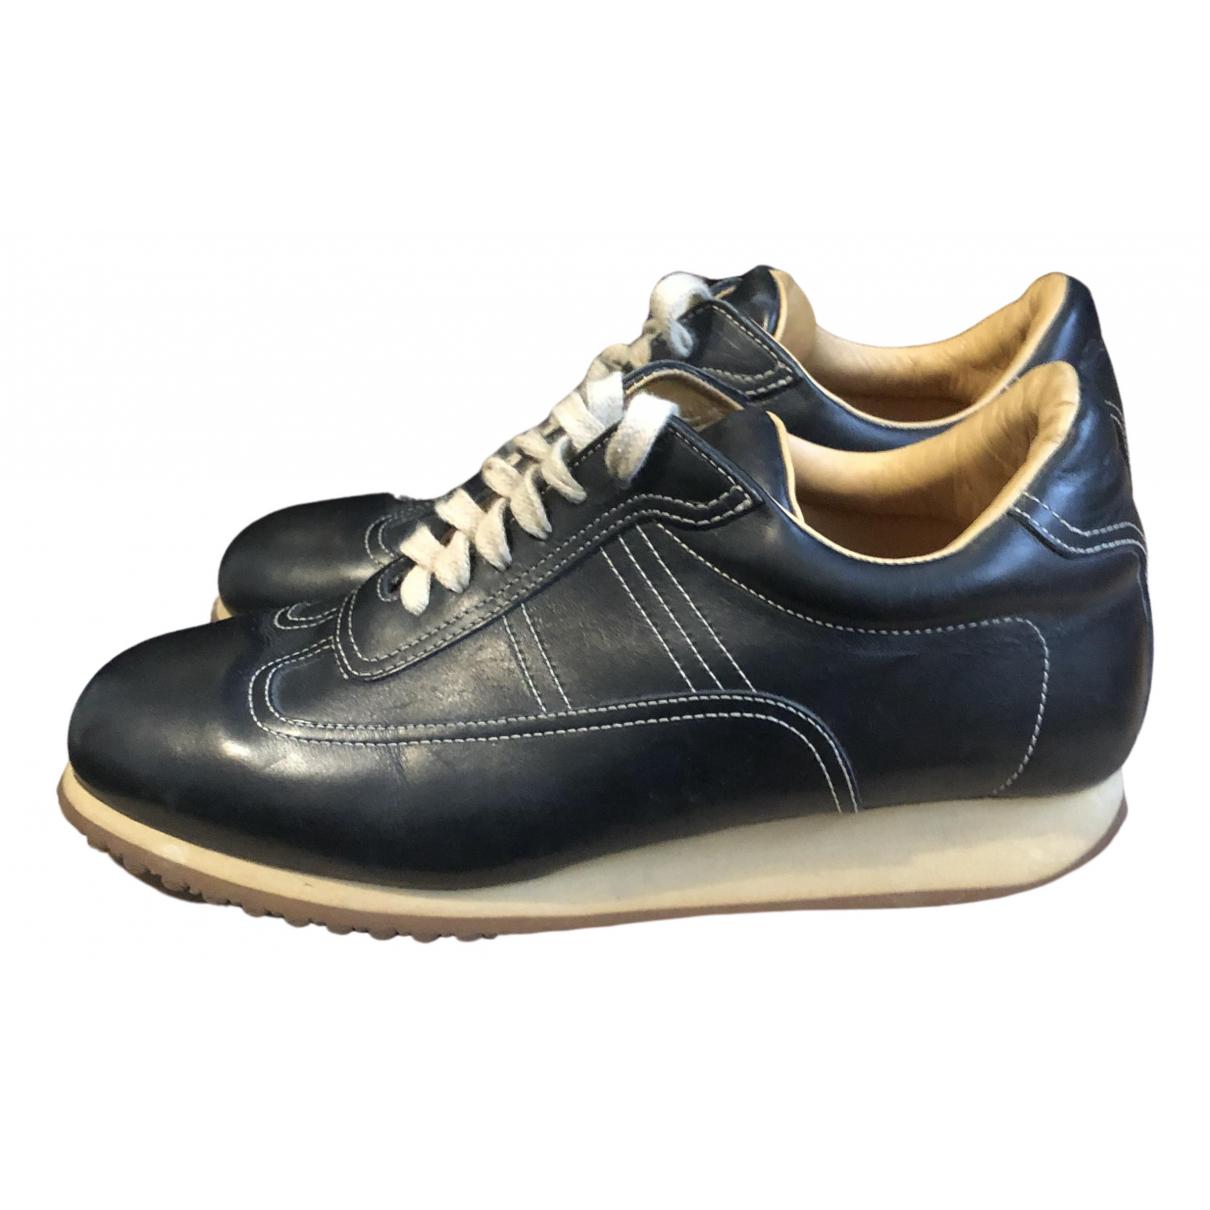 Santoni N Black Leather Trainers for Women 35.5 EU